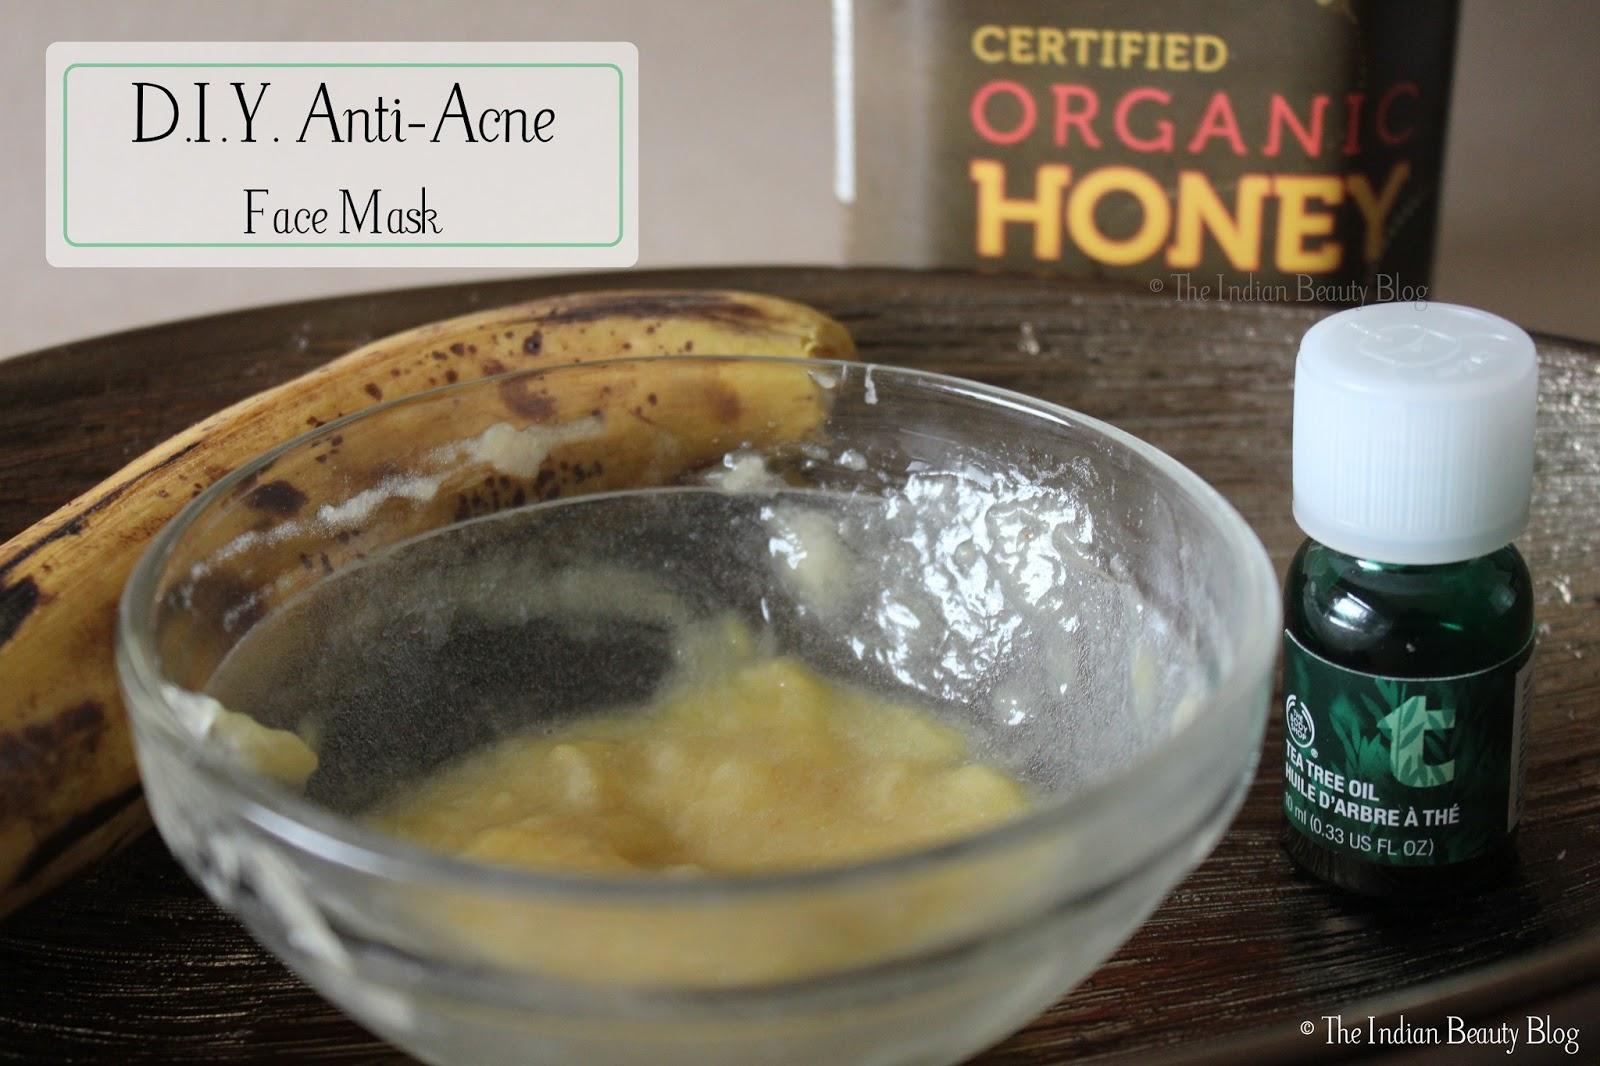 diy anti acne face mask